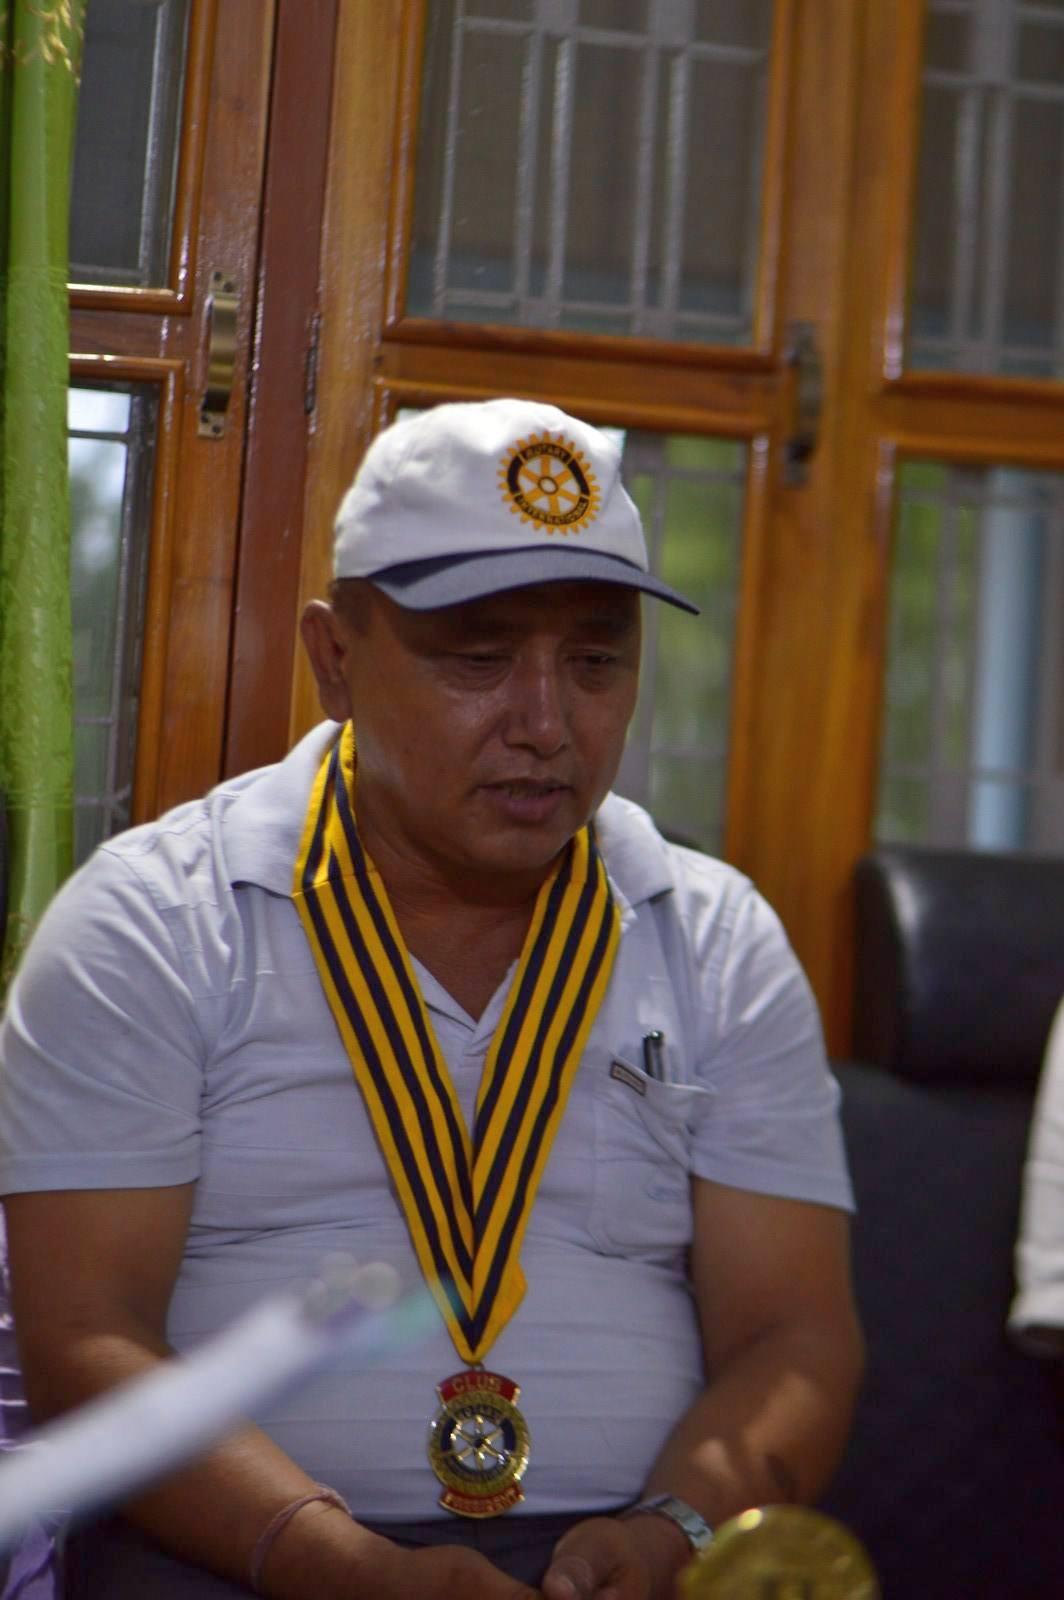 1st-Club-Assembly-2017-18-Rotary-Club-of-Kakarvitta-5